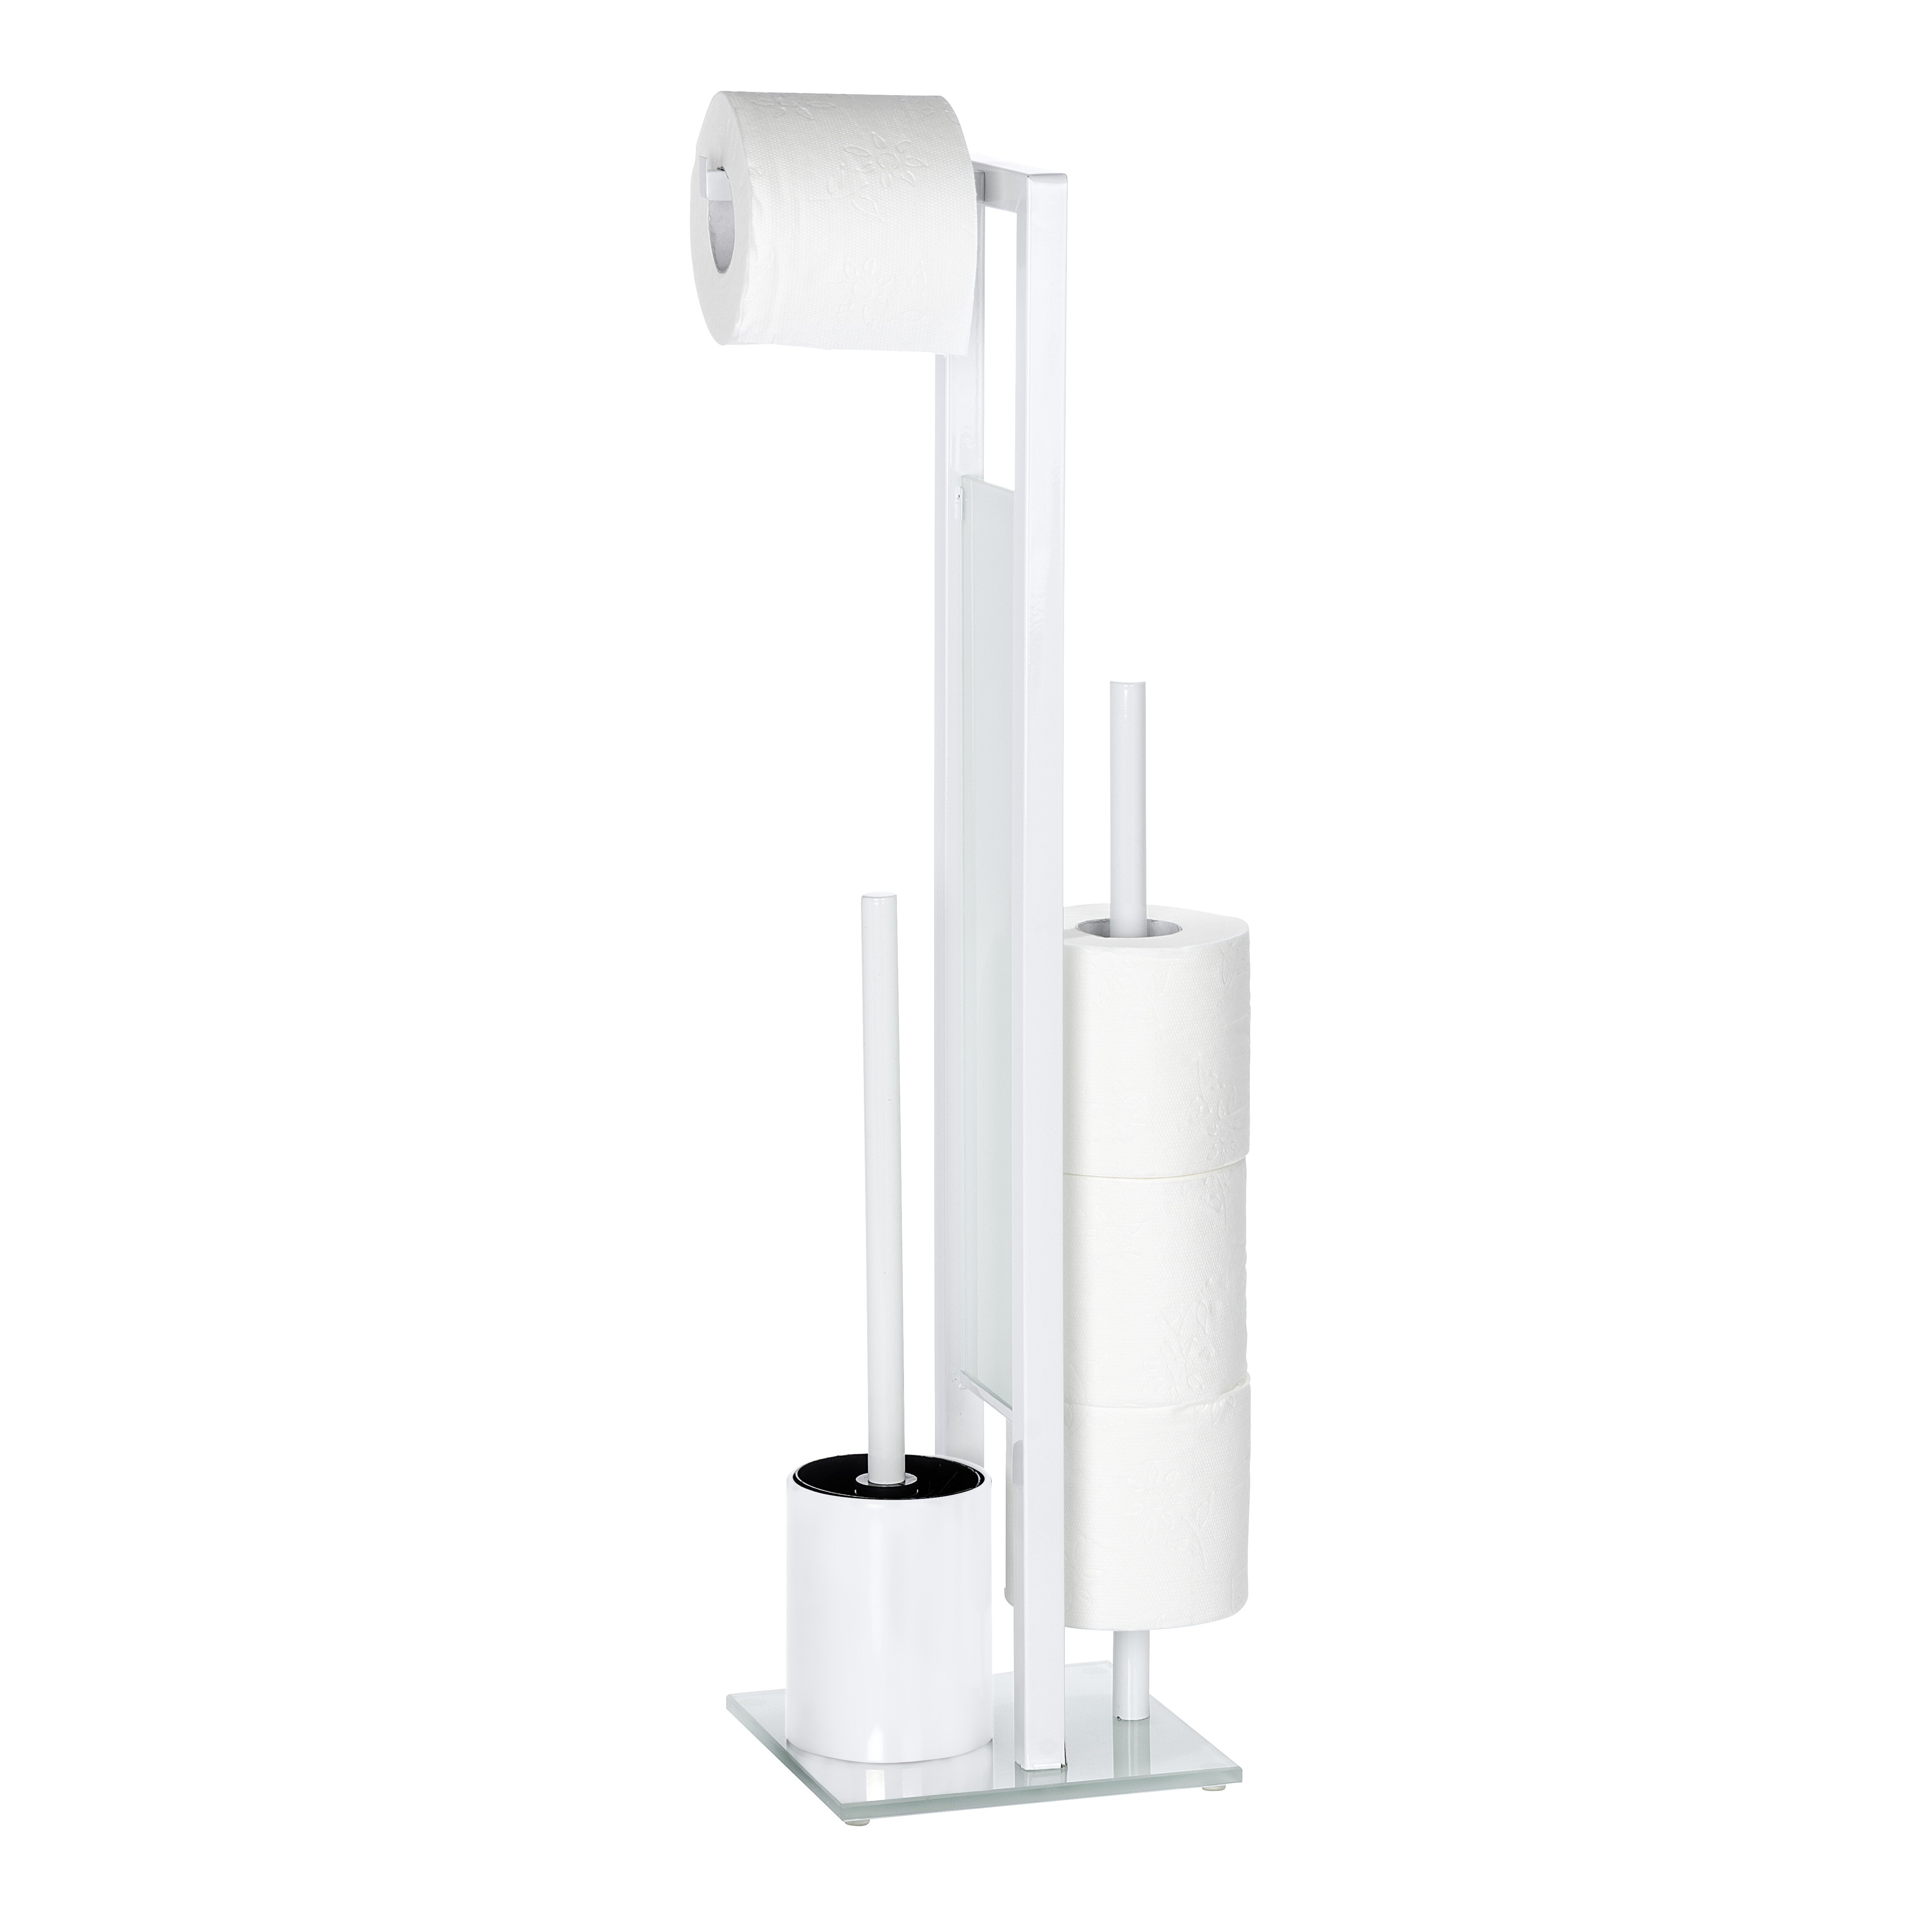 Wenko rivalta free standing toilet roll and brush holder Glass toilet roll holder